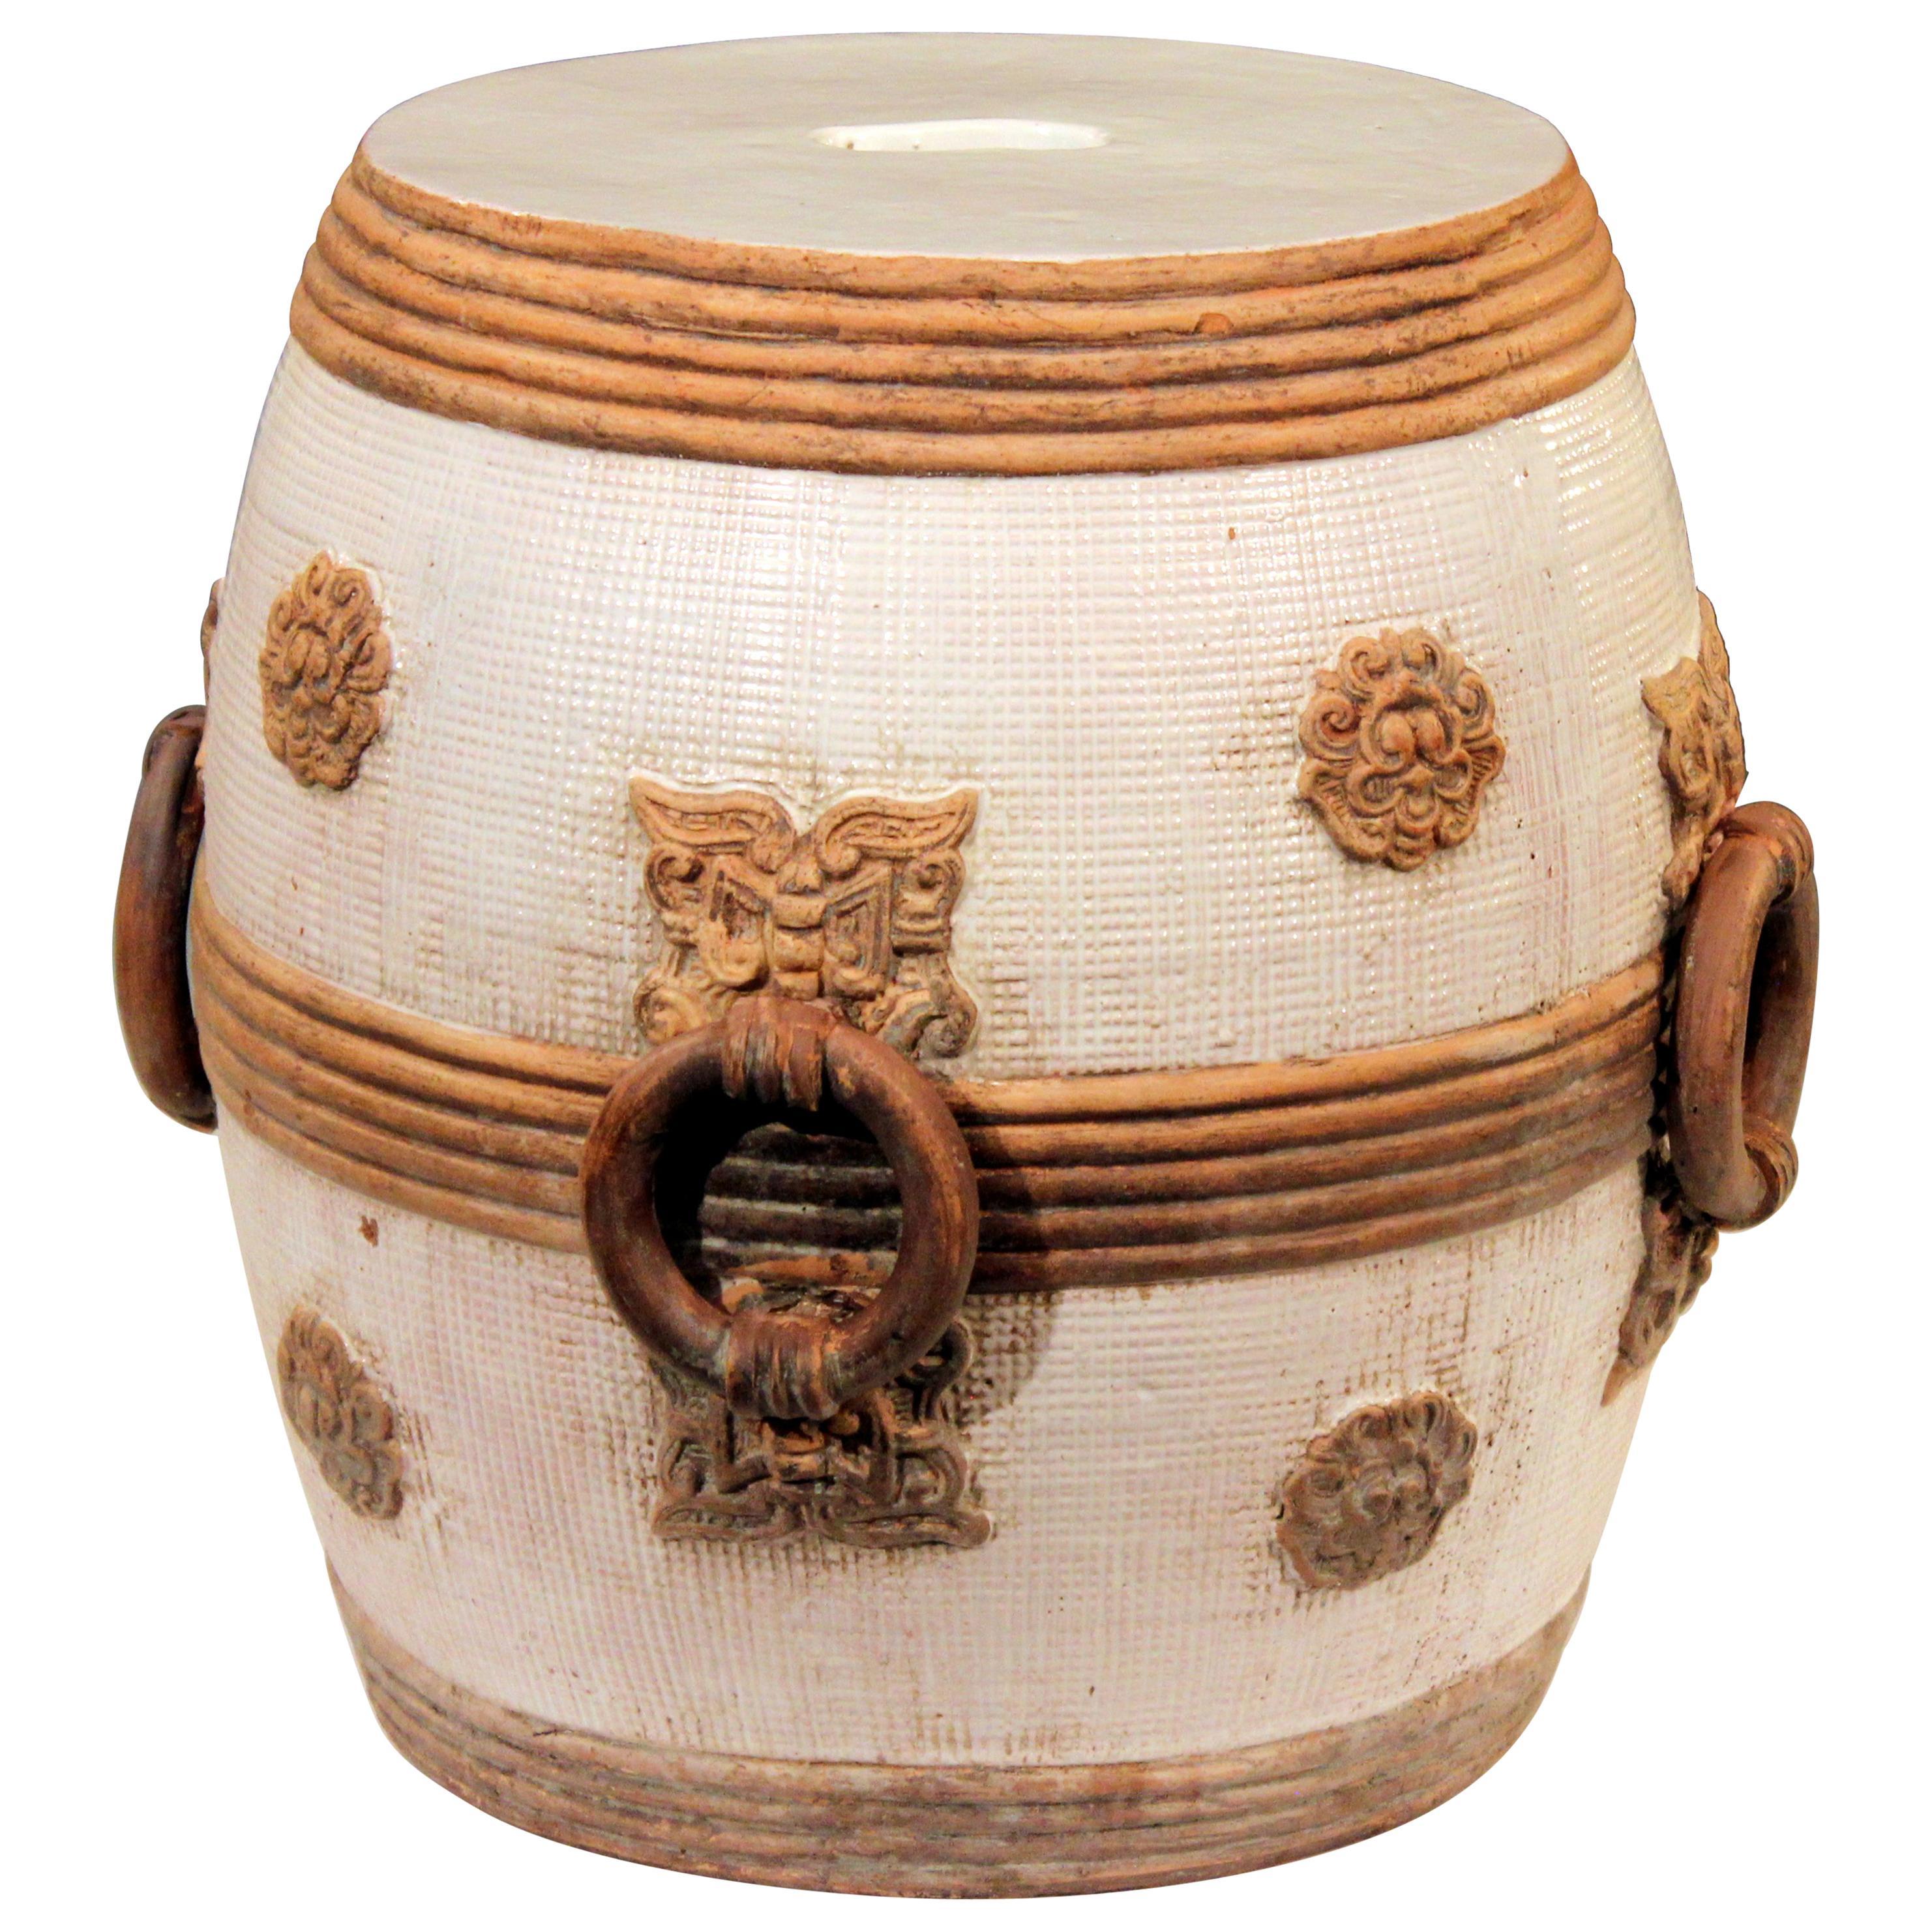 Pleasant Zaccagnini Italian Pottery Garden Seat Stool Ming Style Mask Frankydiablos Diy Chair Ideas Frankydiabloscom